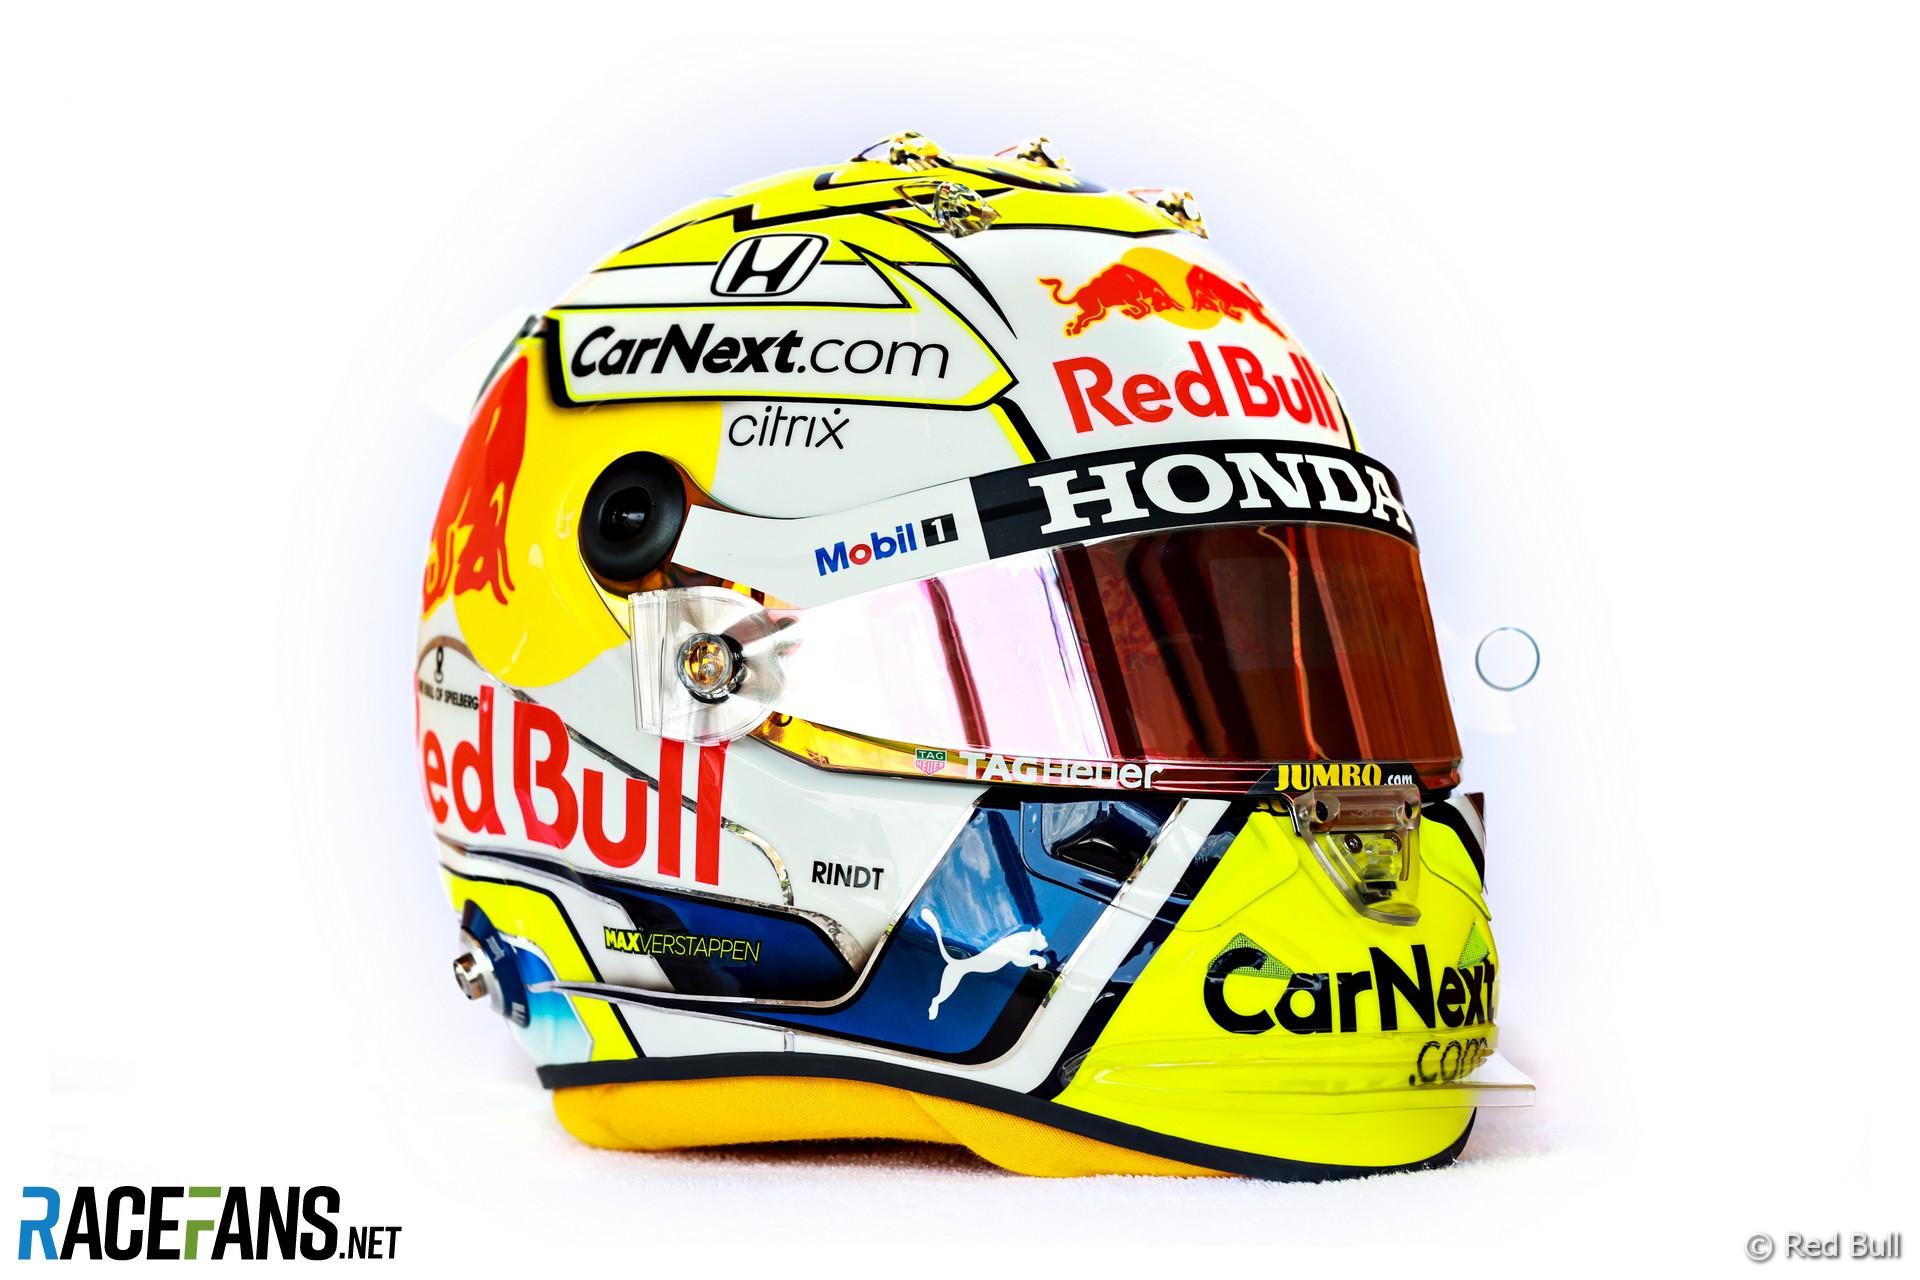 Max Verstappen's Styrian Grand Prix helmet